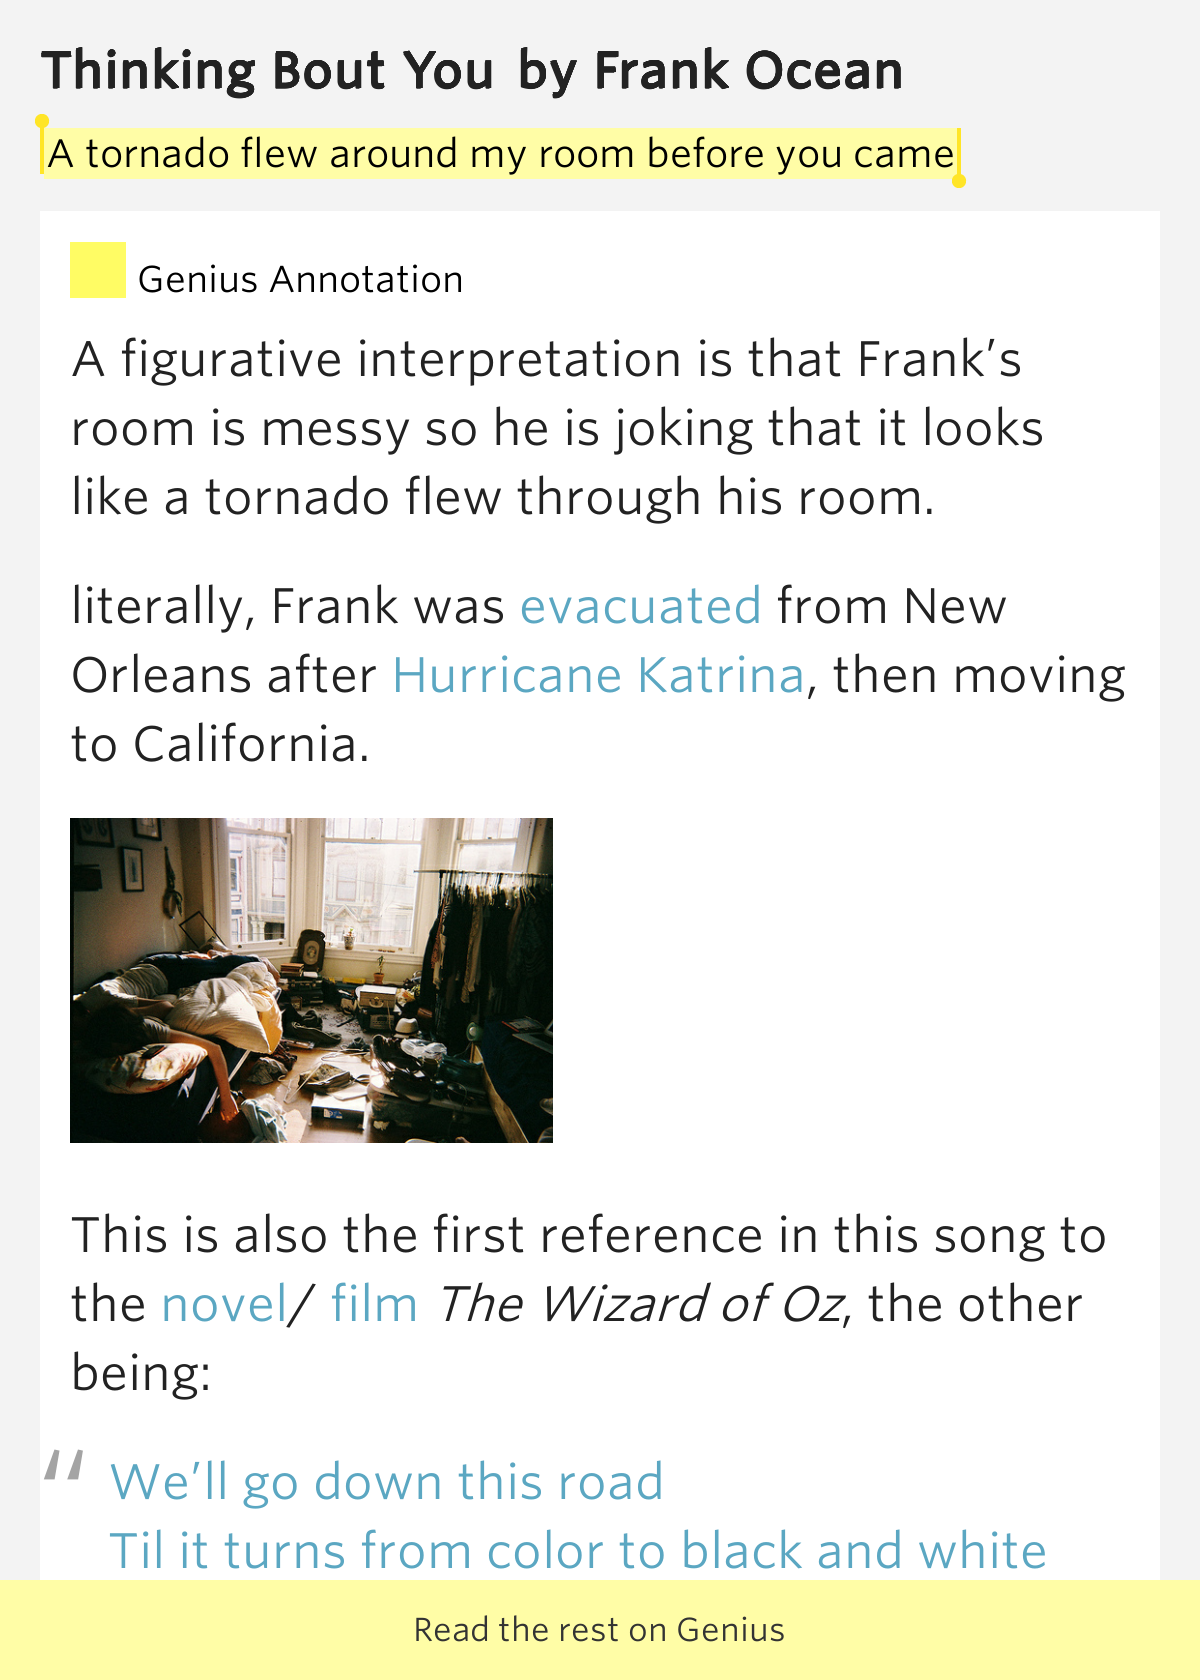 Frank Ocean - Thinking About You Lyrics | MetroLyrics